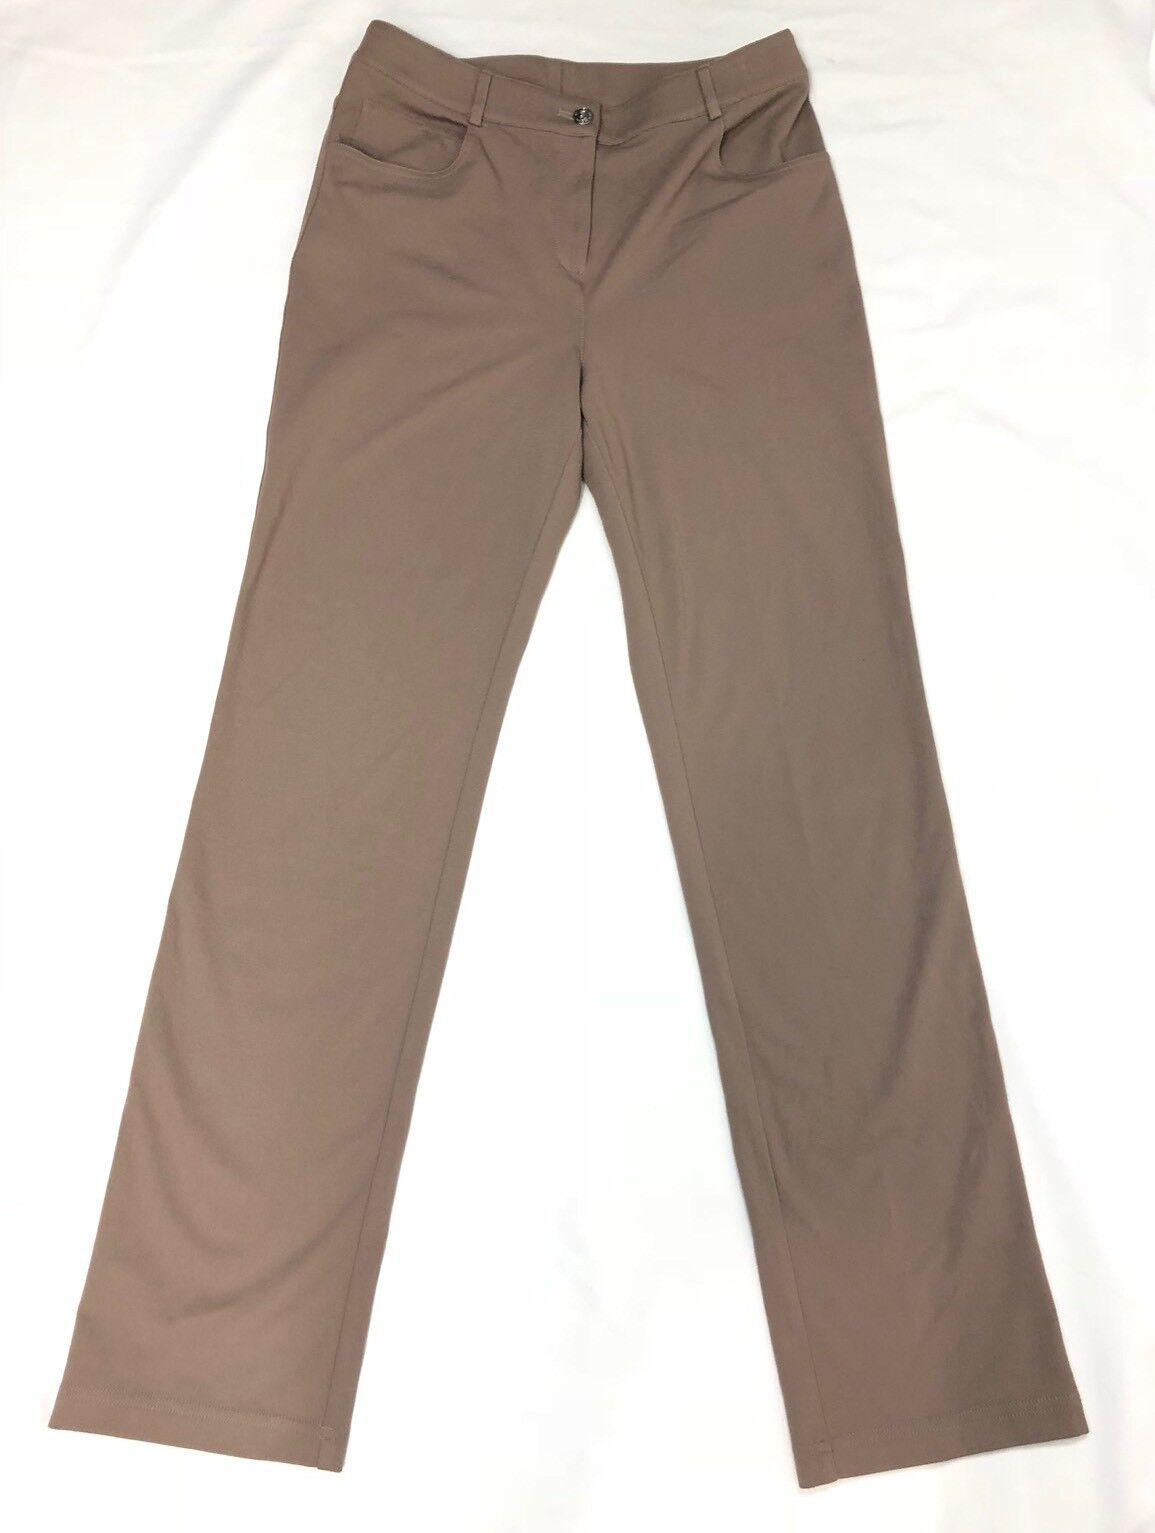 St. John Women Taupe Flat Front Pants Size 6 (30x33) Excellent